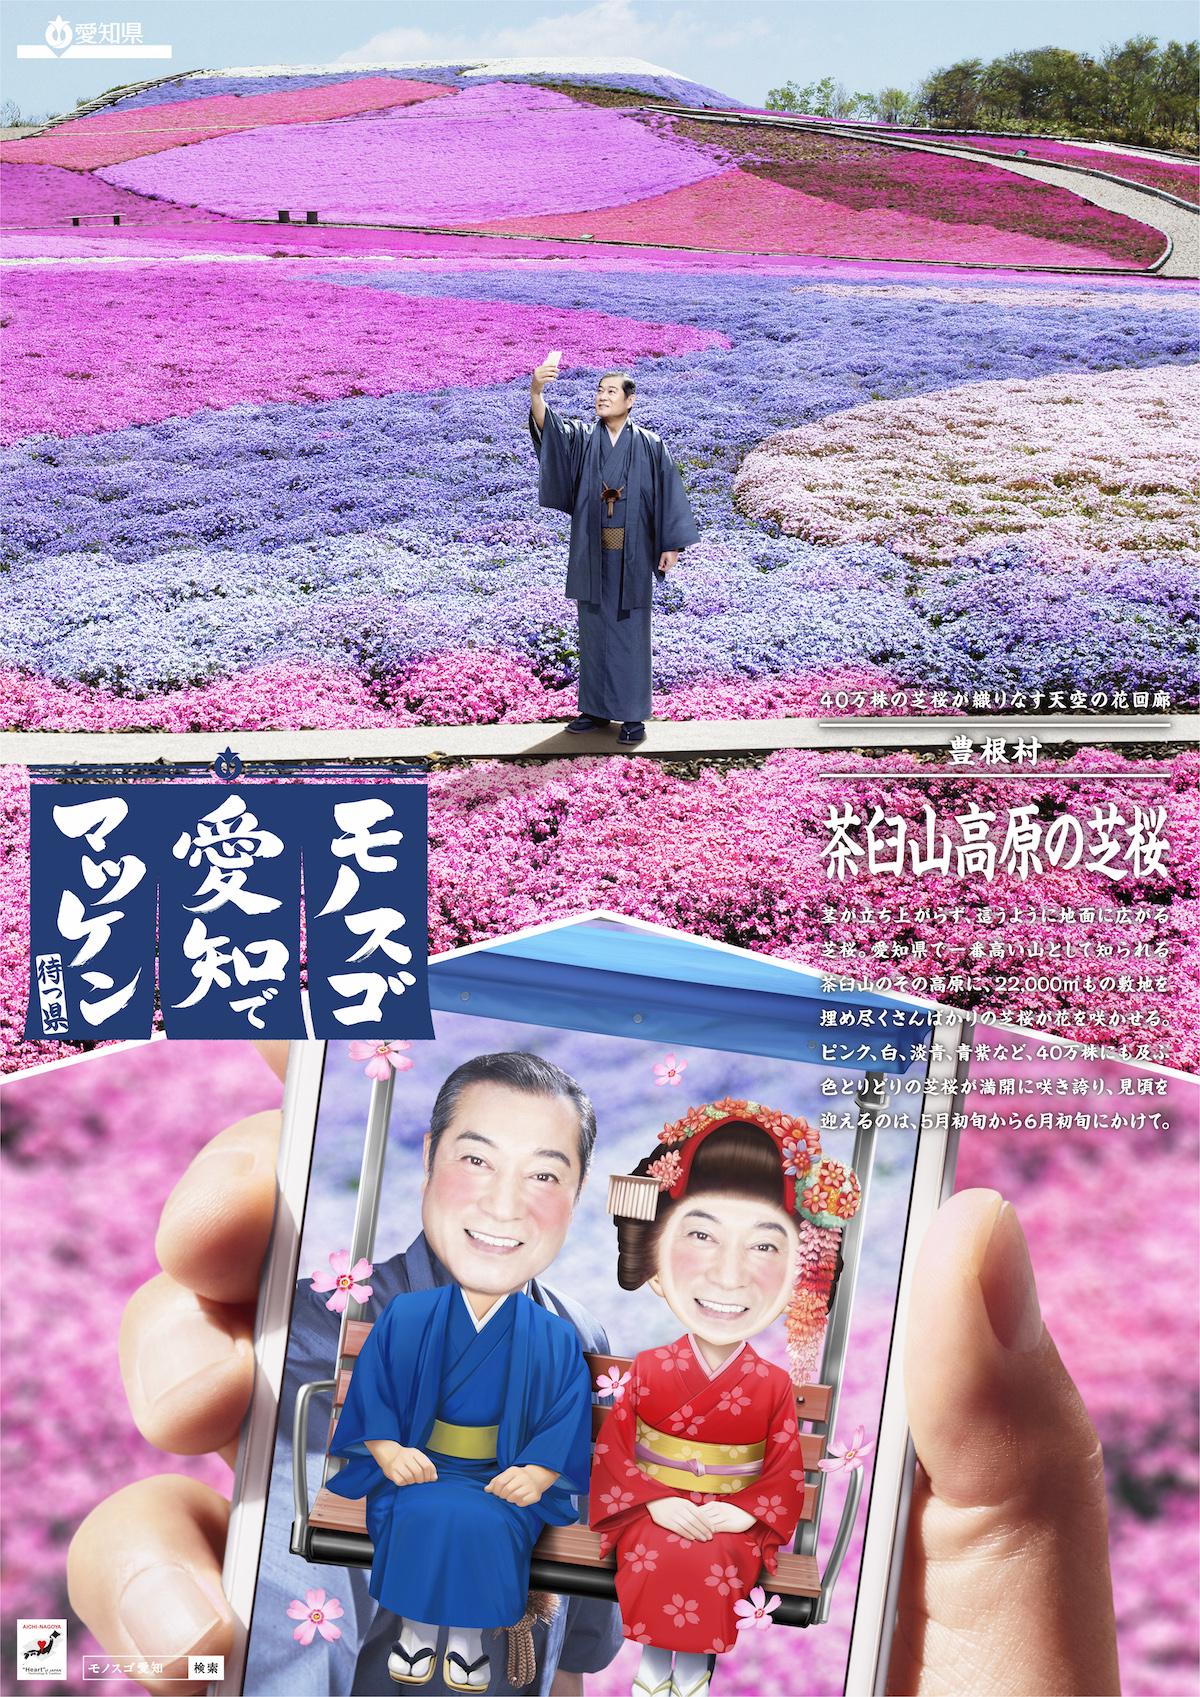 「茶臼山高原の芝桜」篇